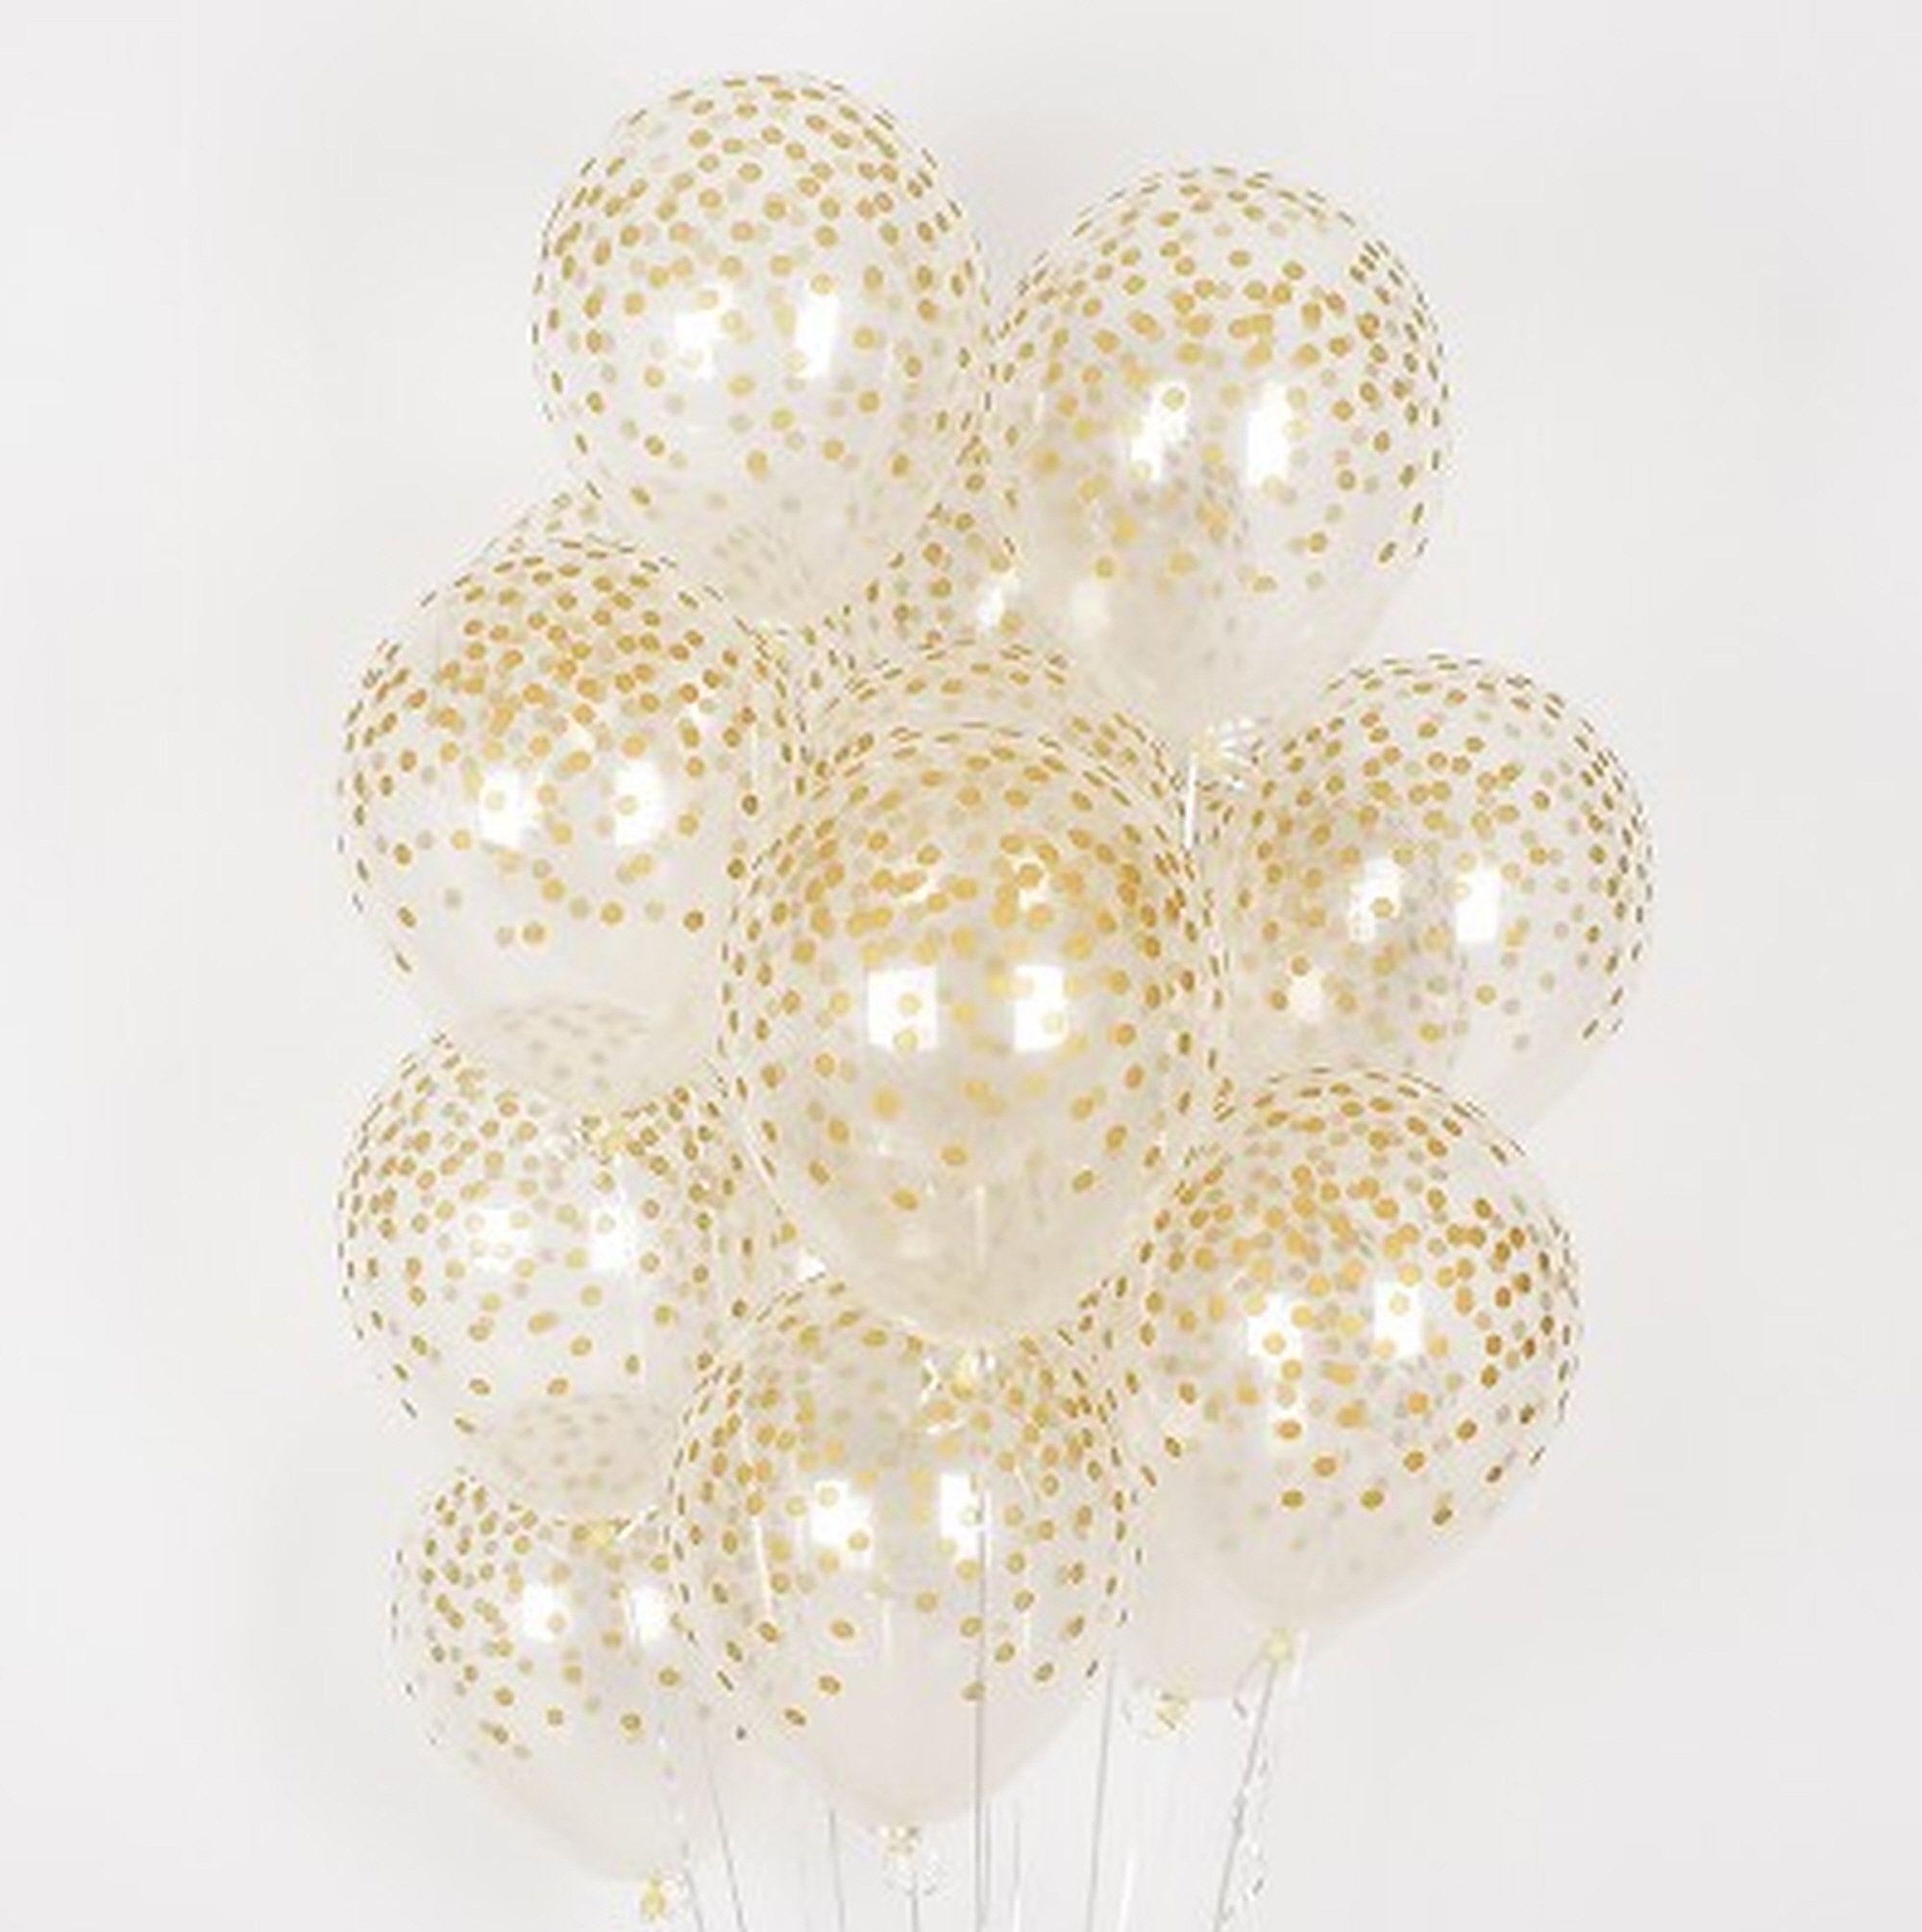 20X Gray Polka dot Latex Balloons Birthday Babyshower Wedding Party Decorations